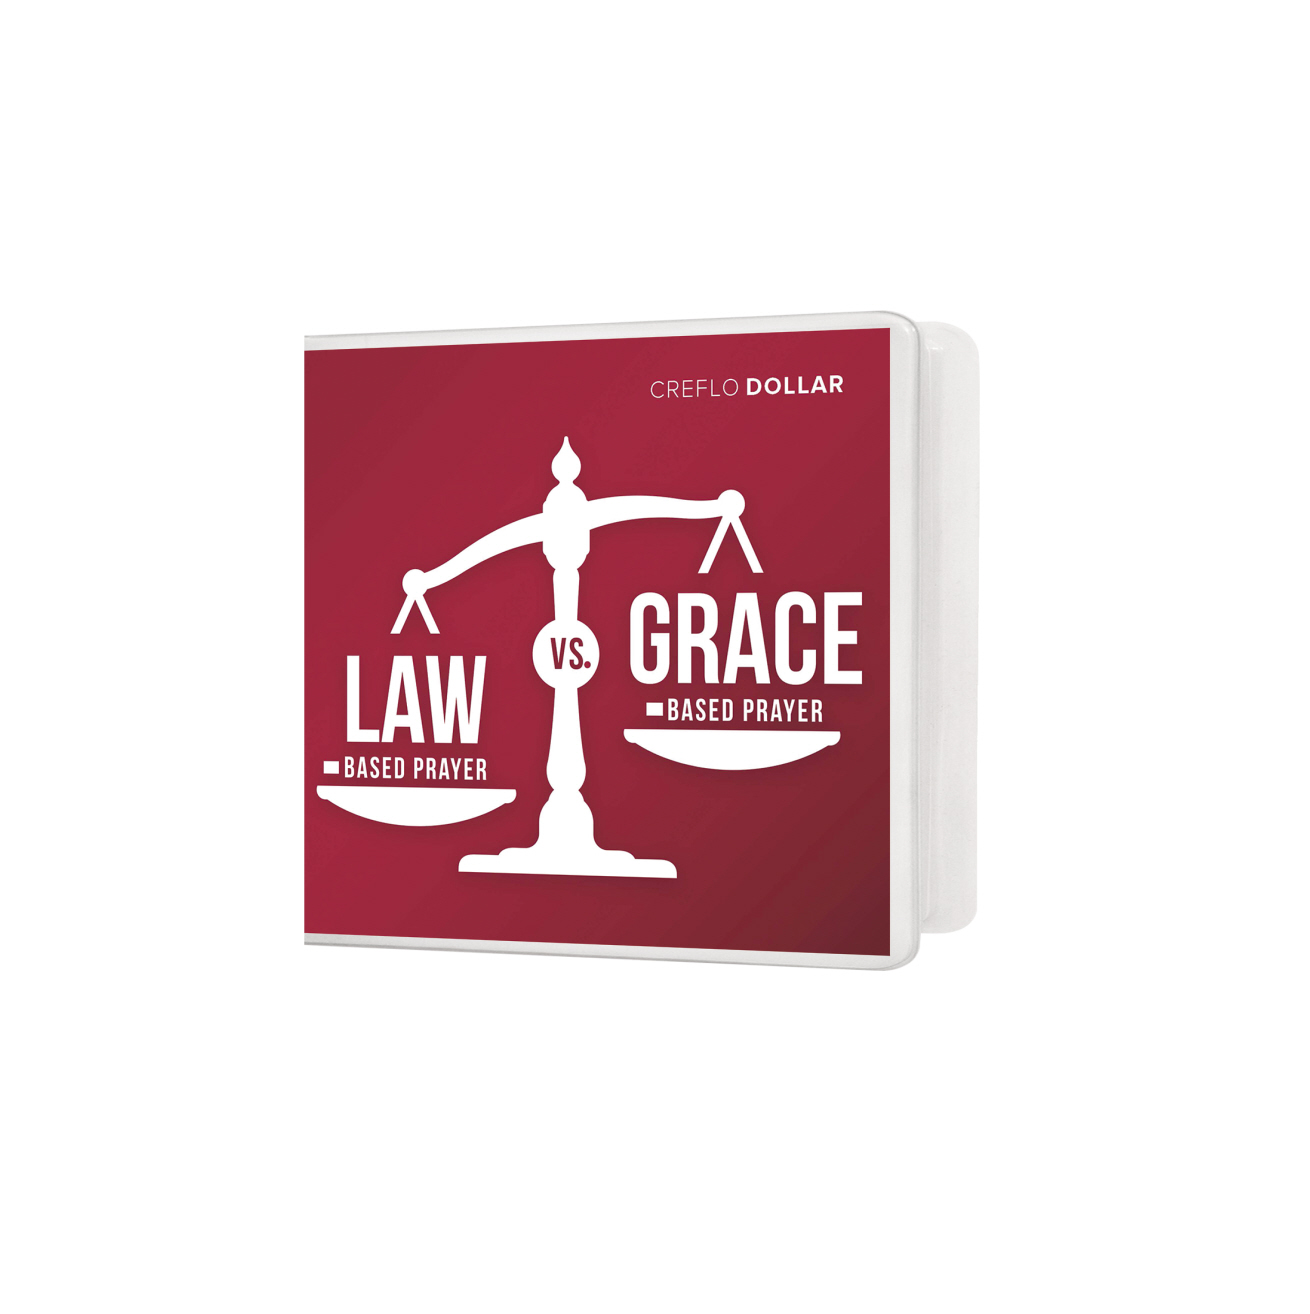 Law-Based-Prayer-vs-grace-based-prayer